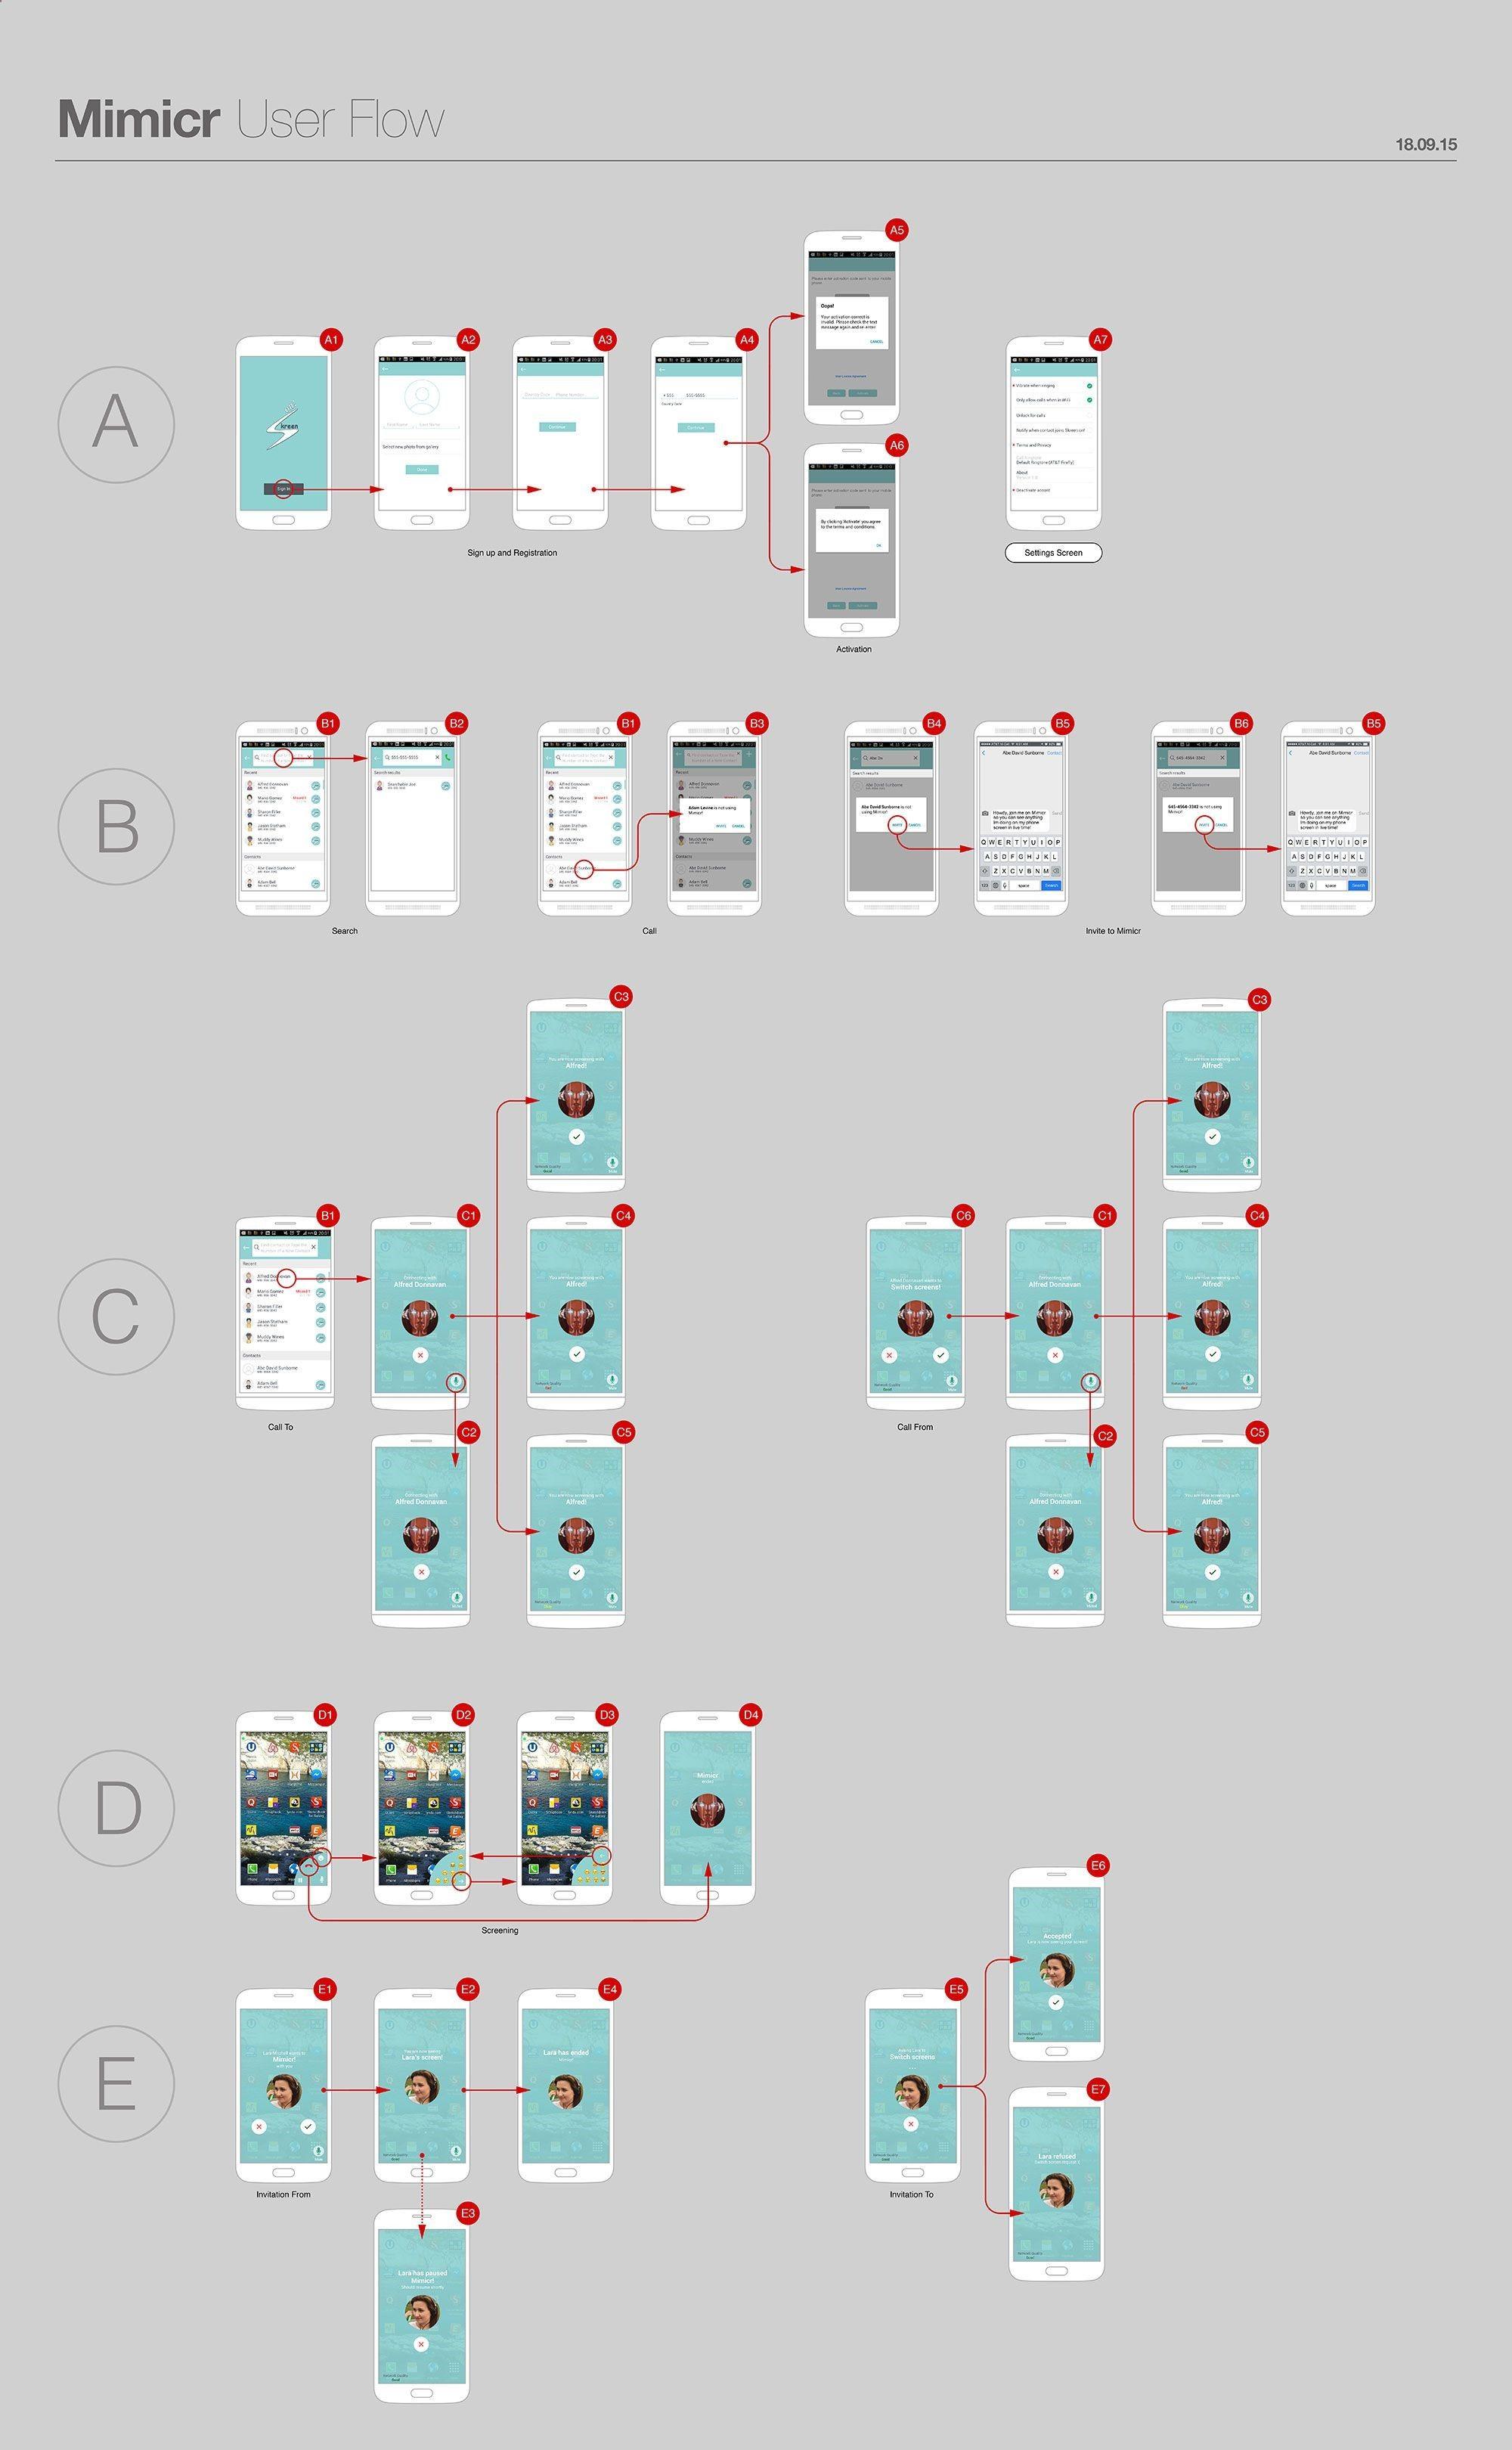 UX/UI Design User flow diagram by kmdesignhouse.com | WEB + UX + UI ...